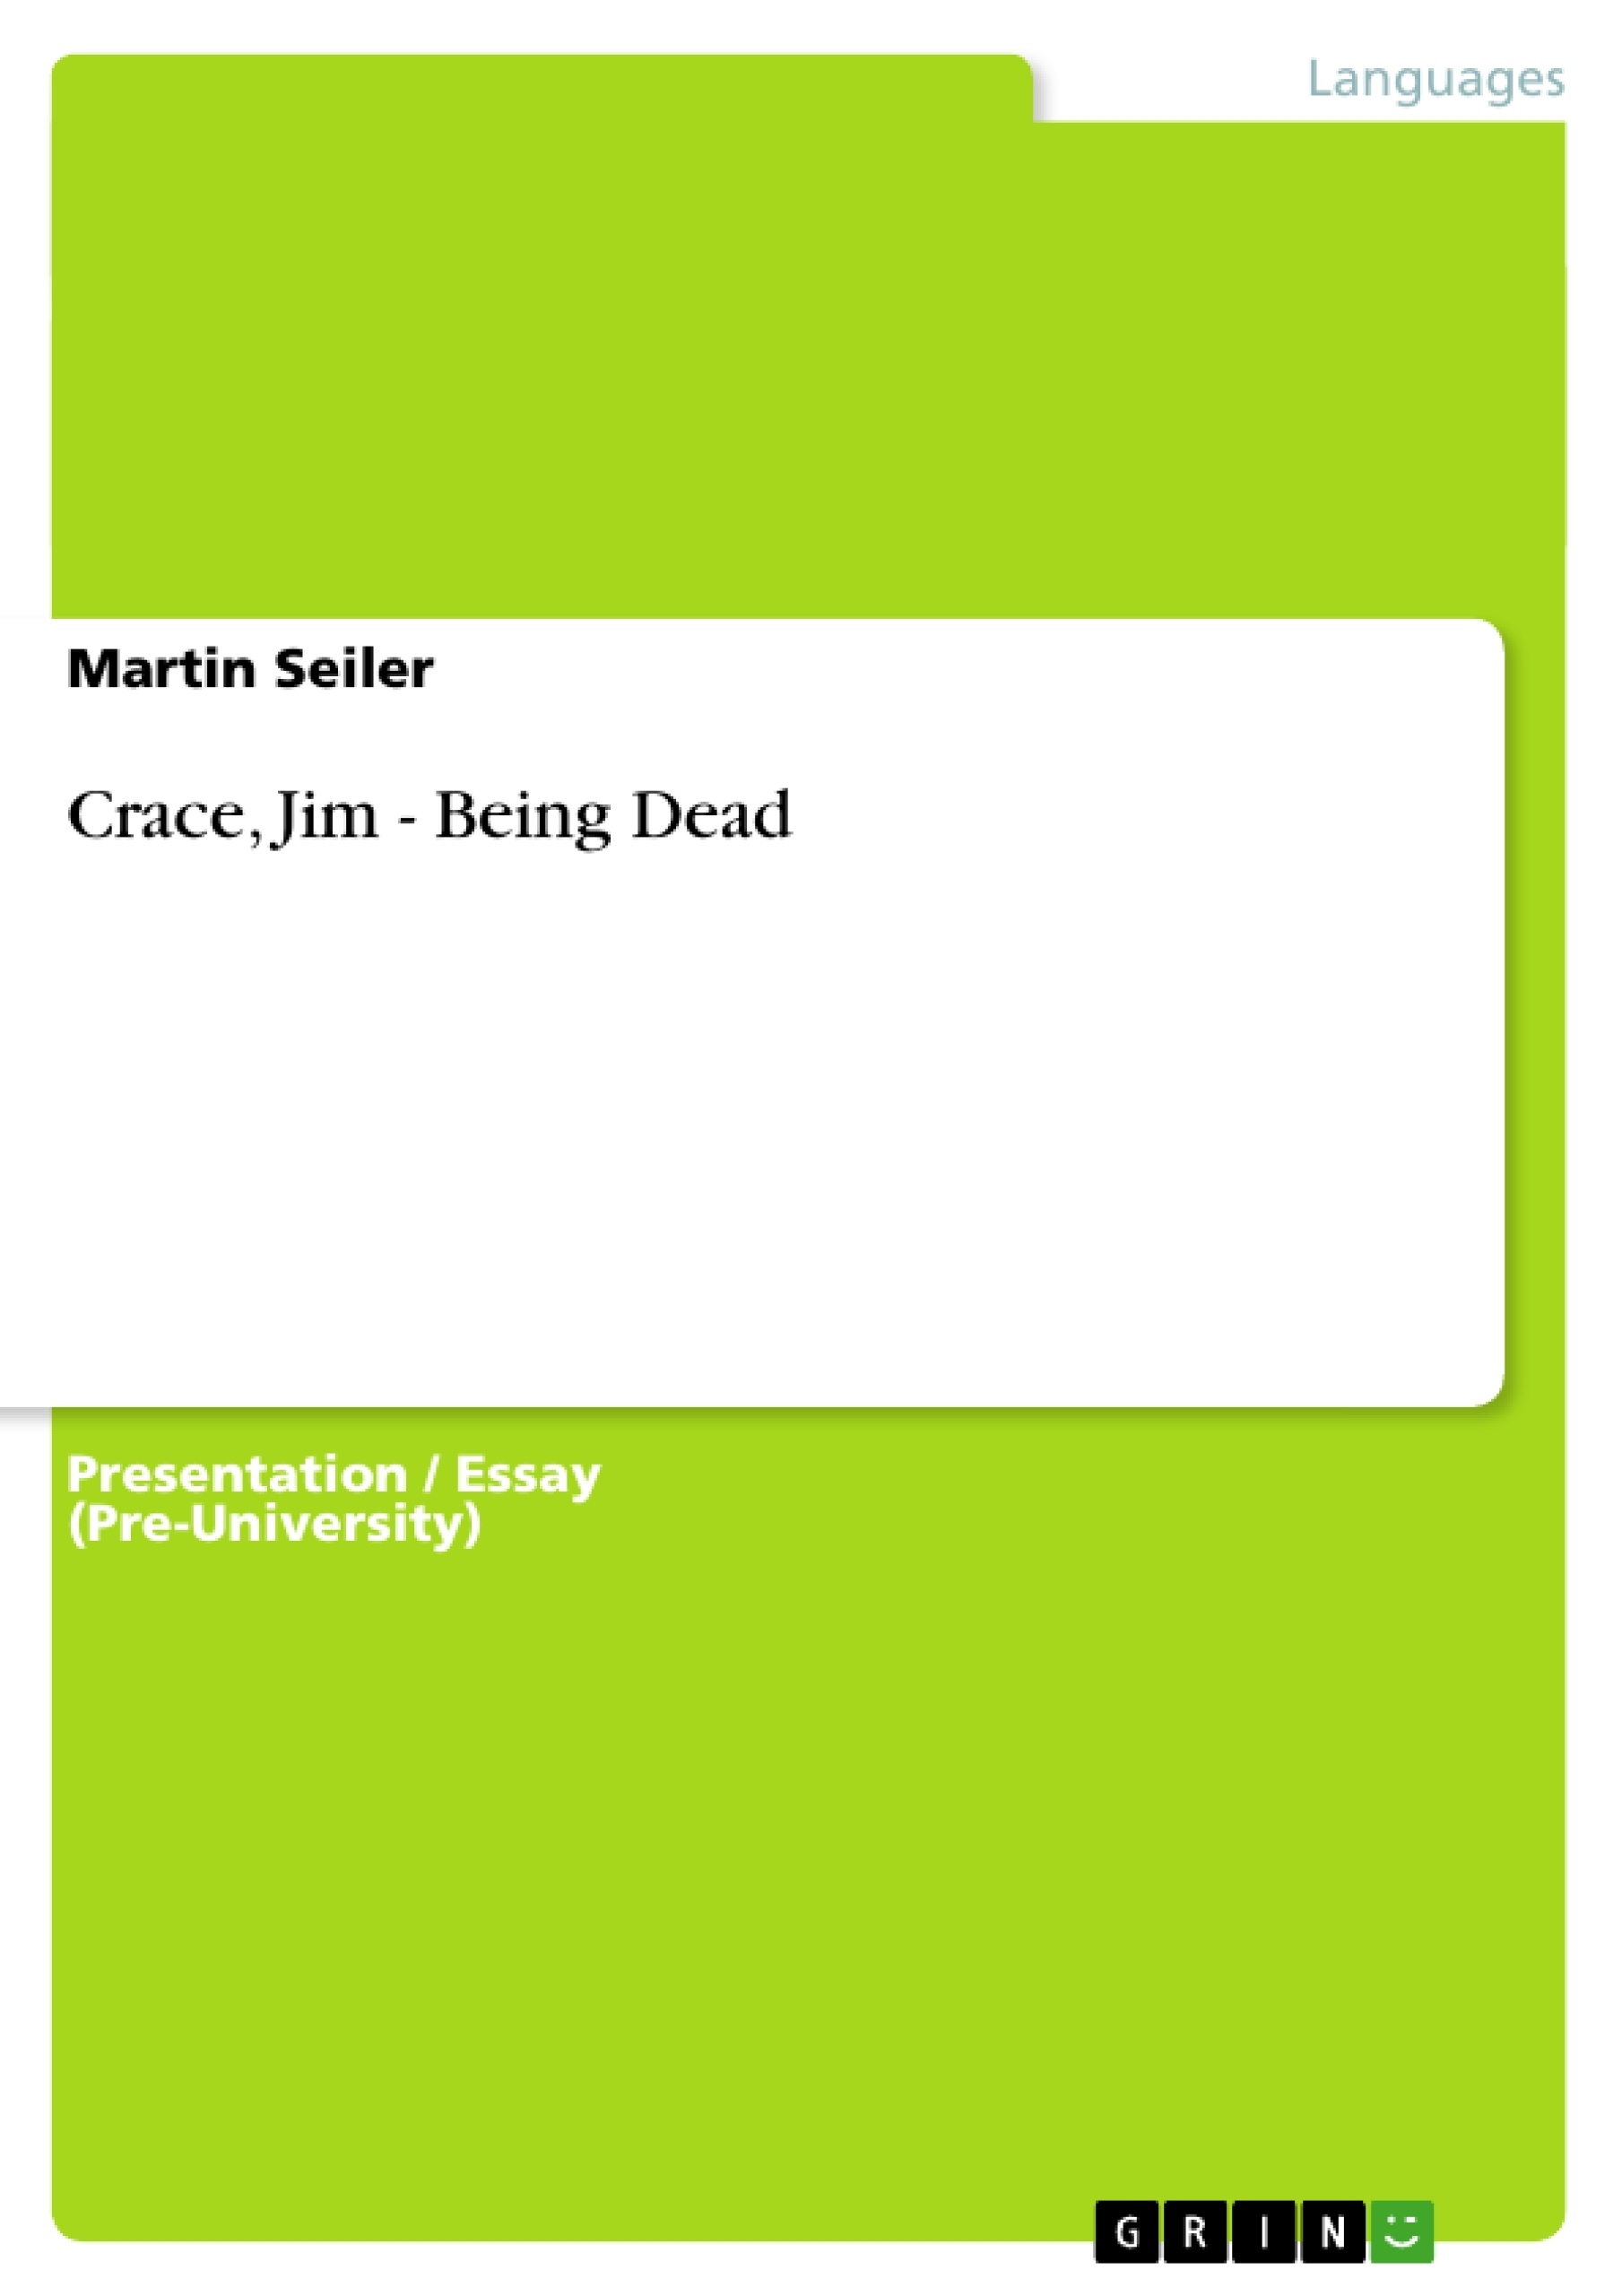 Title: Crace, Jim - Being Dead